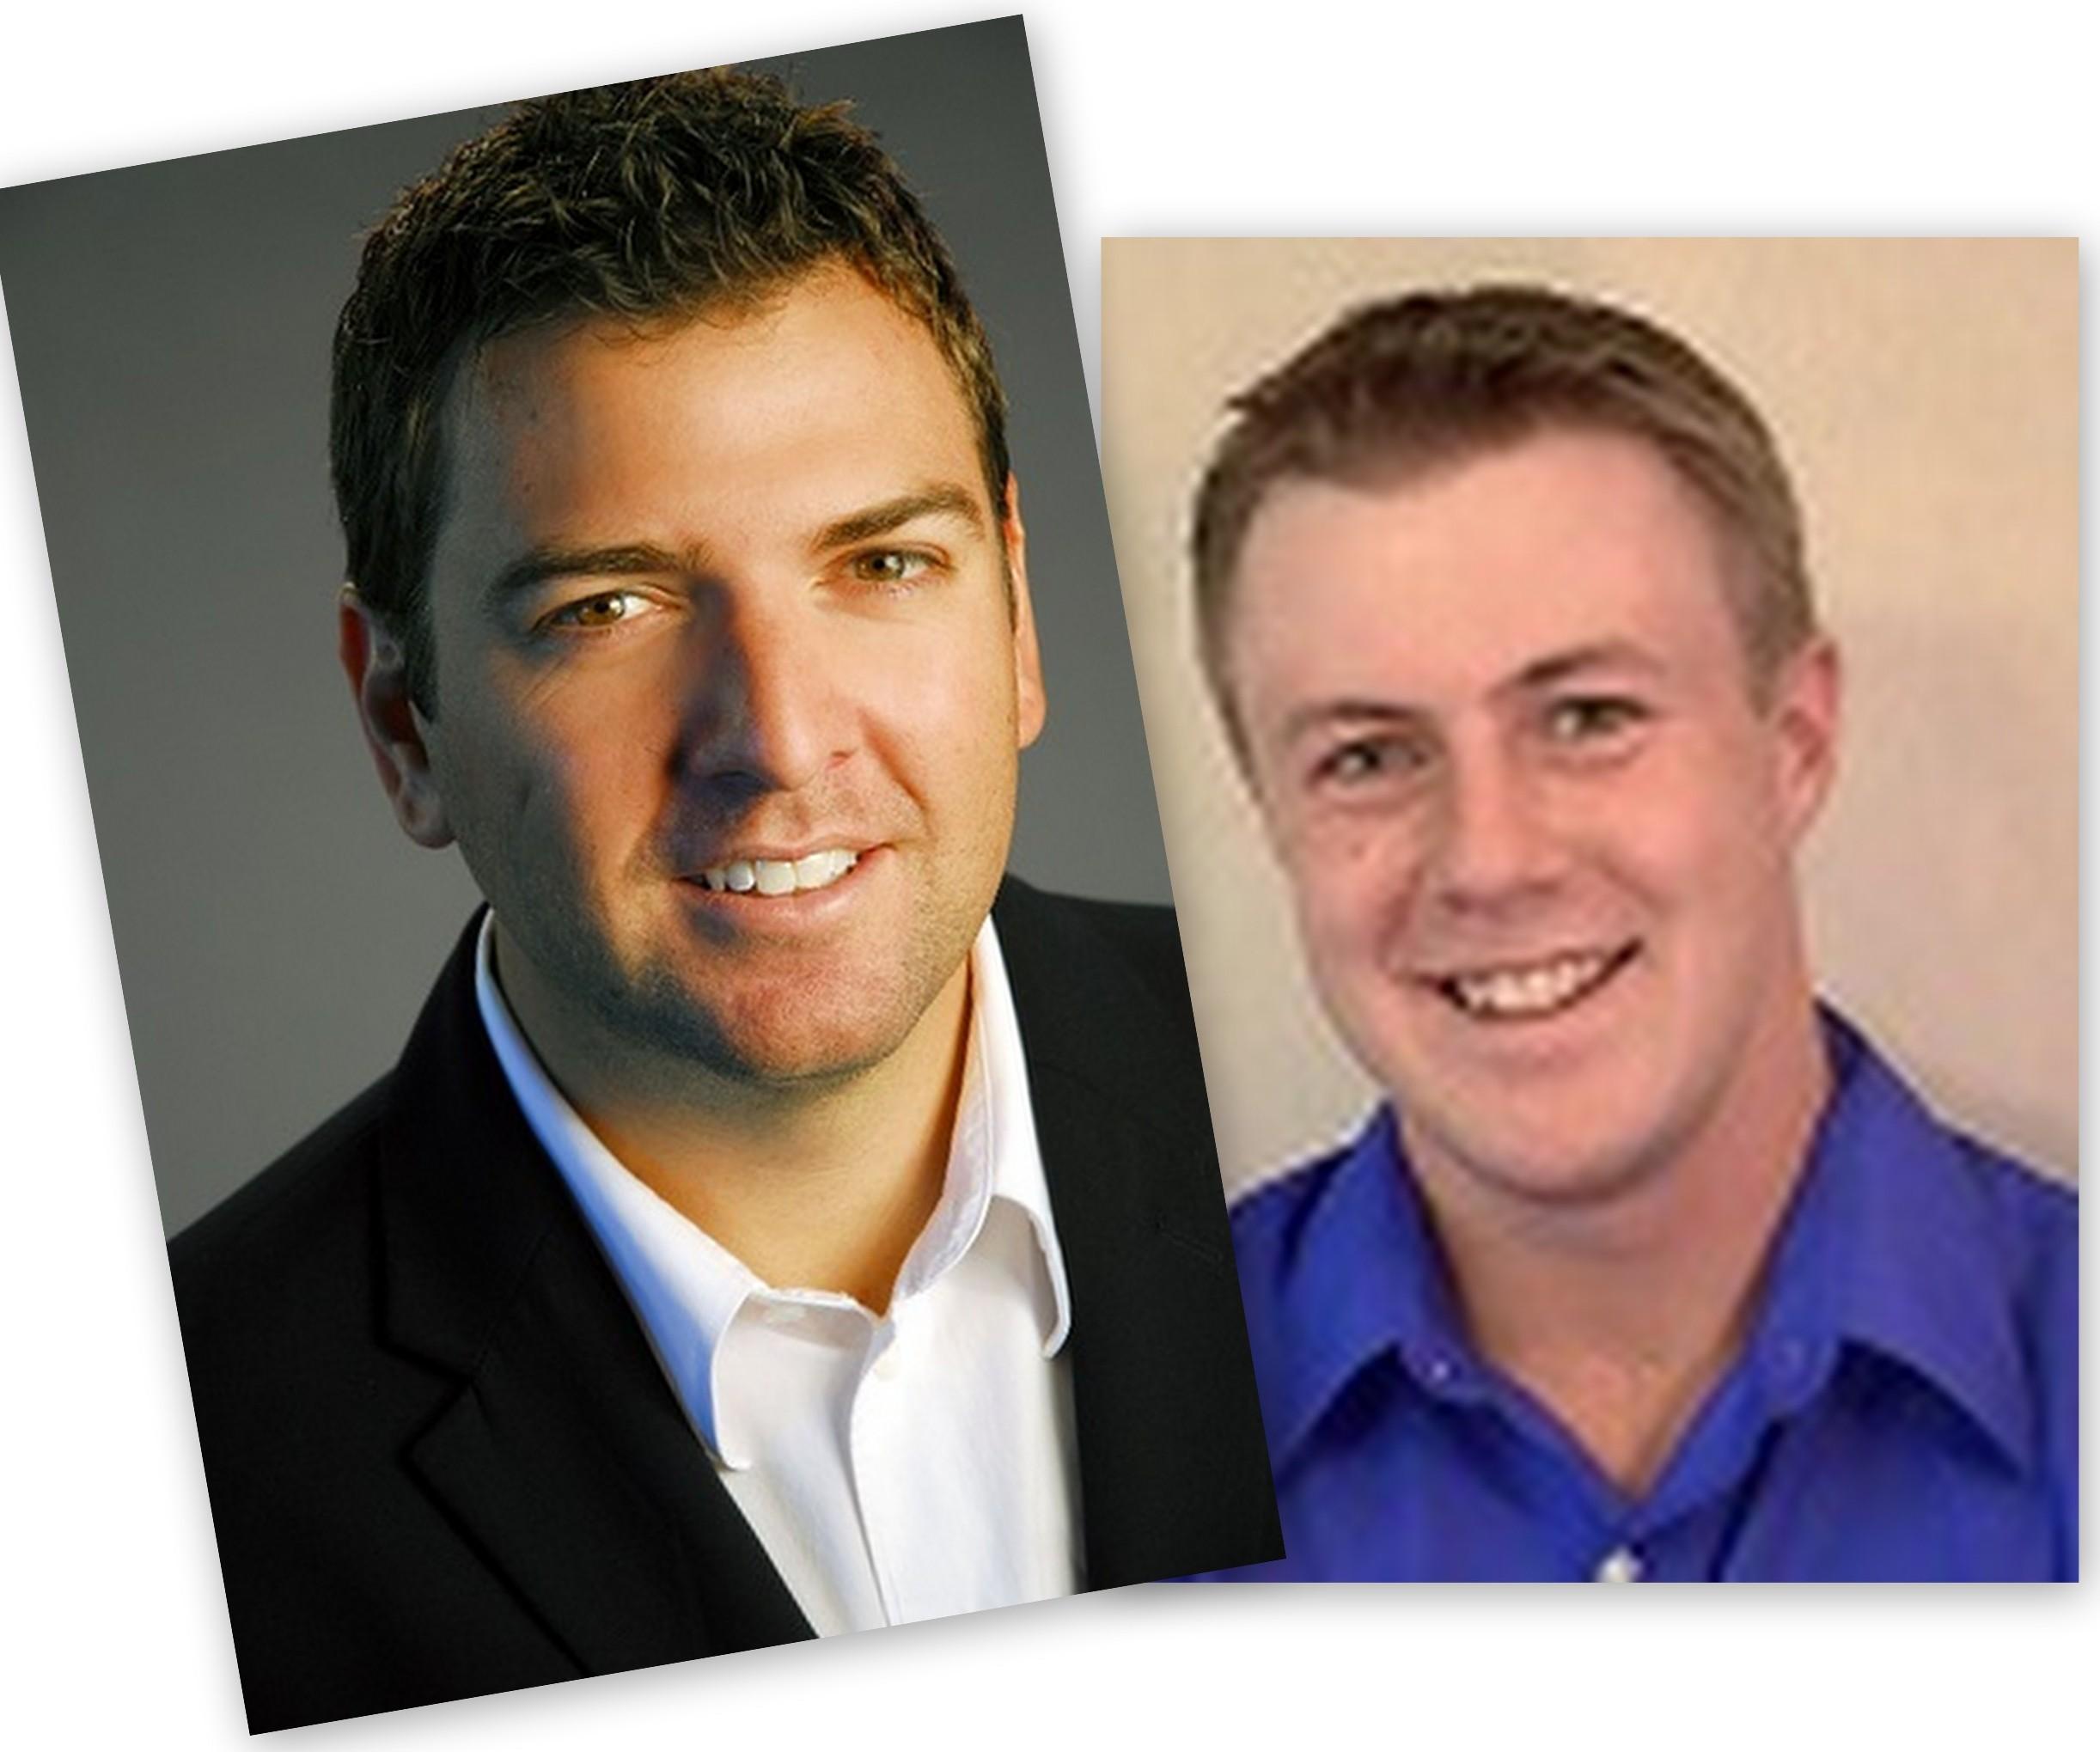 Chris Voth & Talon Saucerman